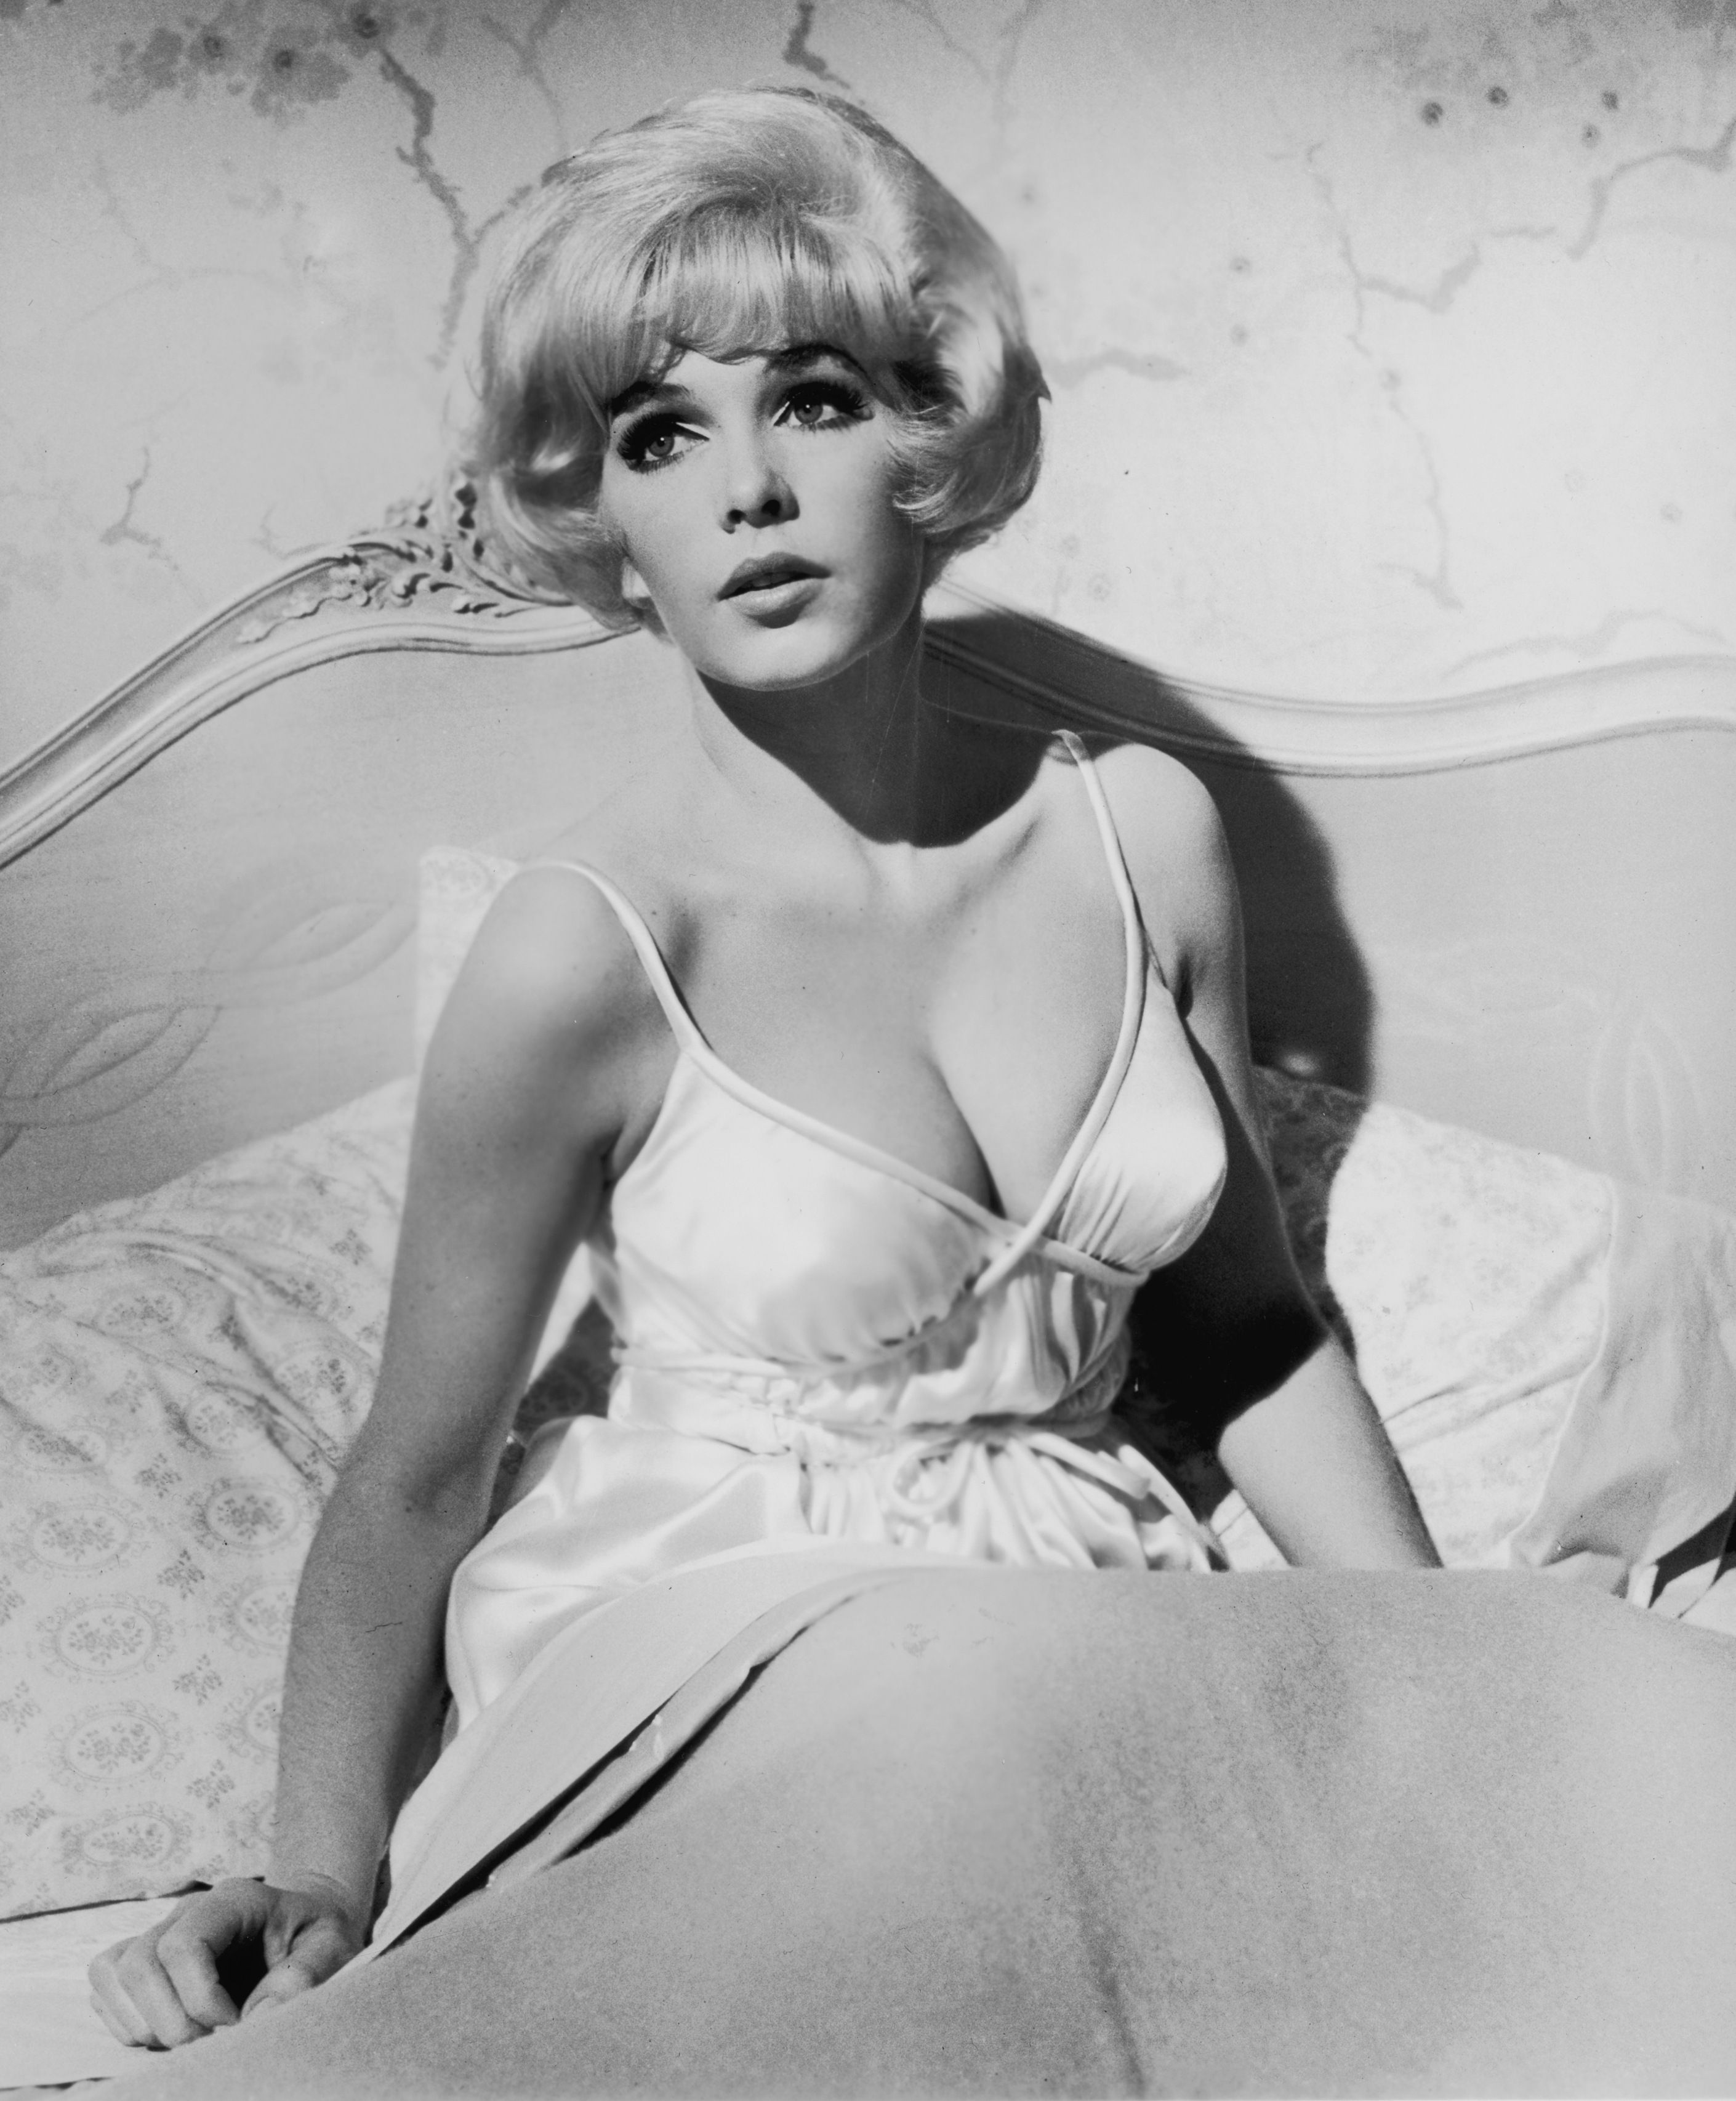 Celeb Vintage Naked Photo Gallery Pic